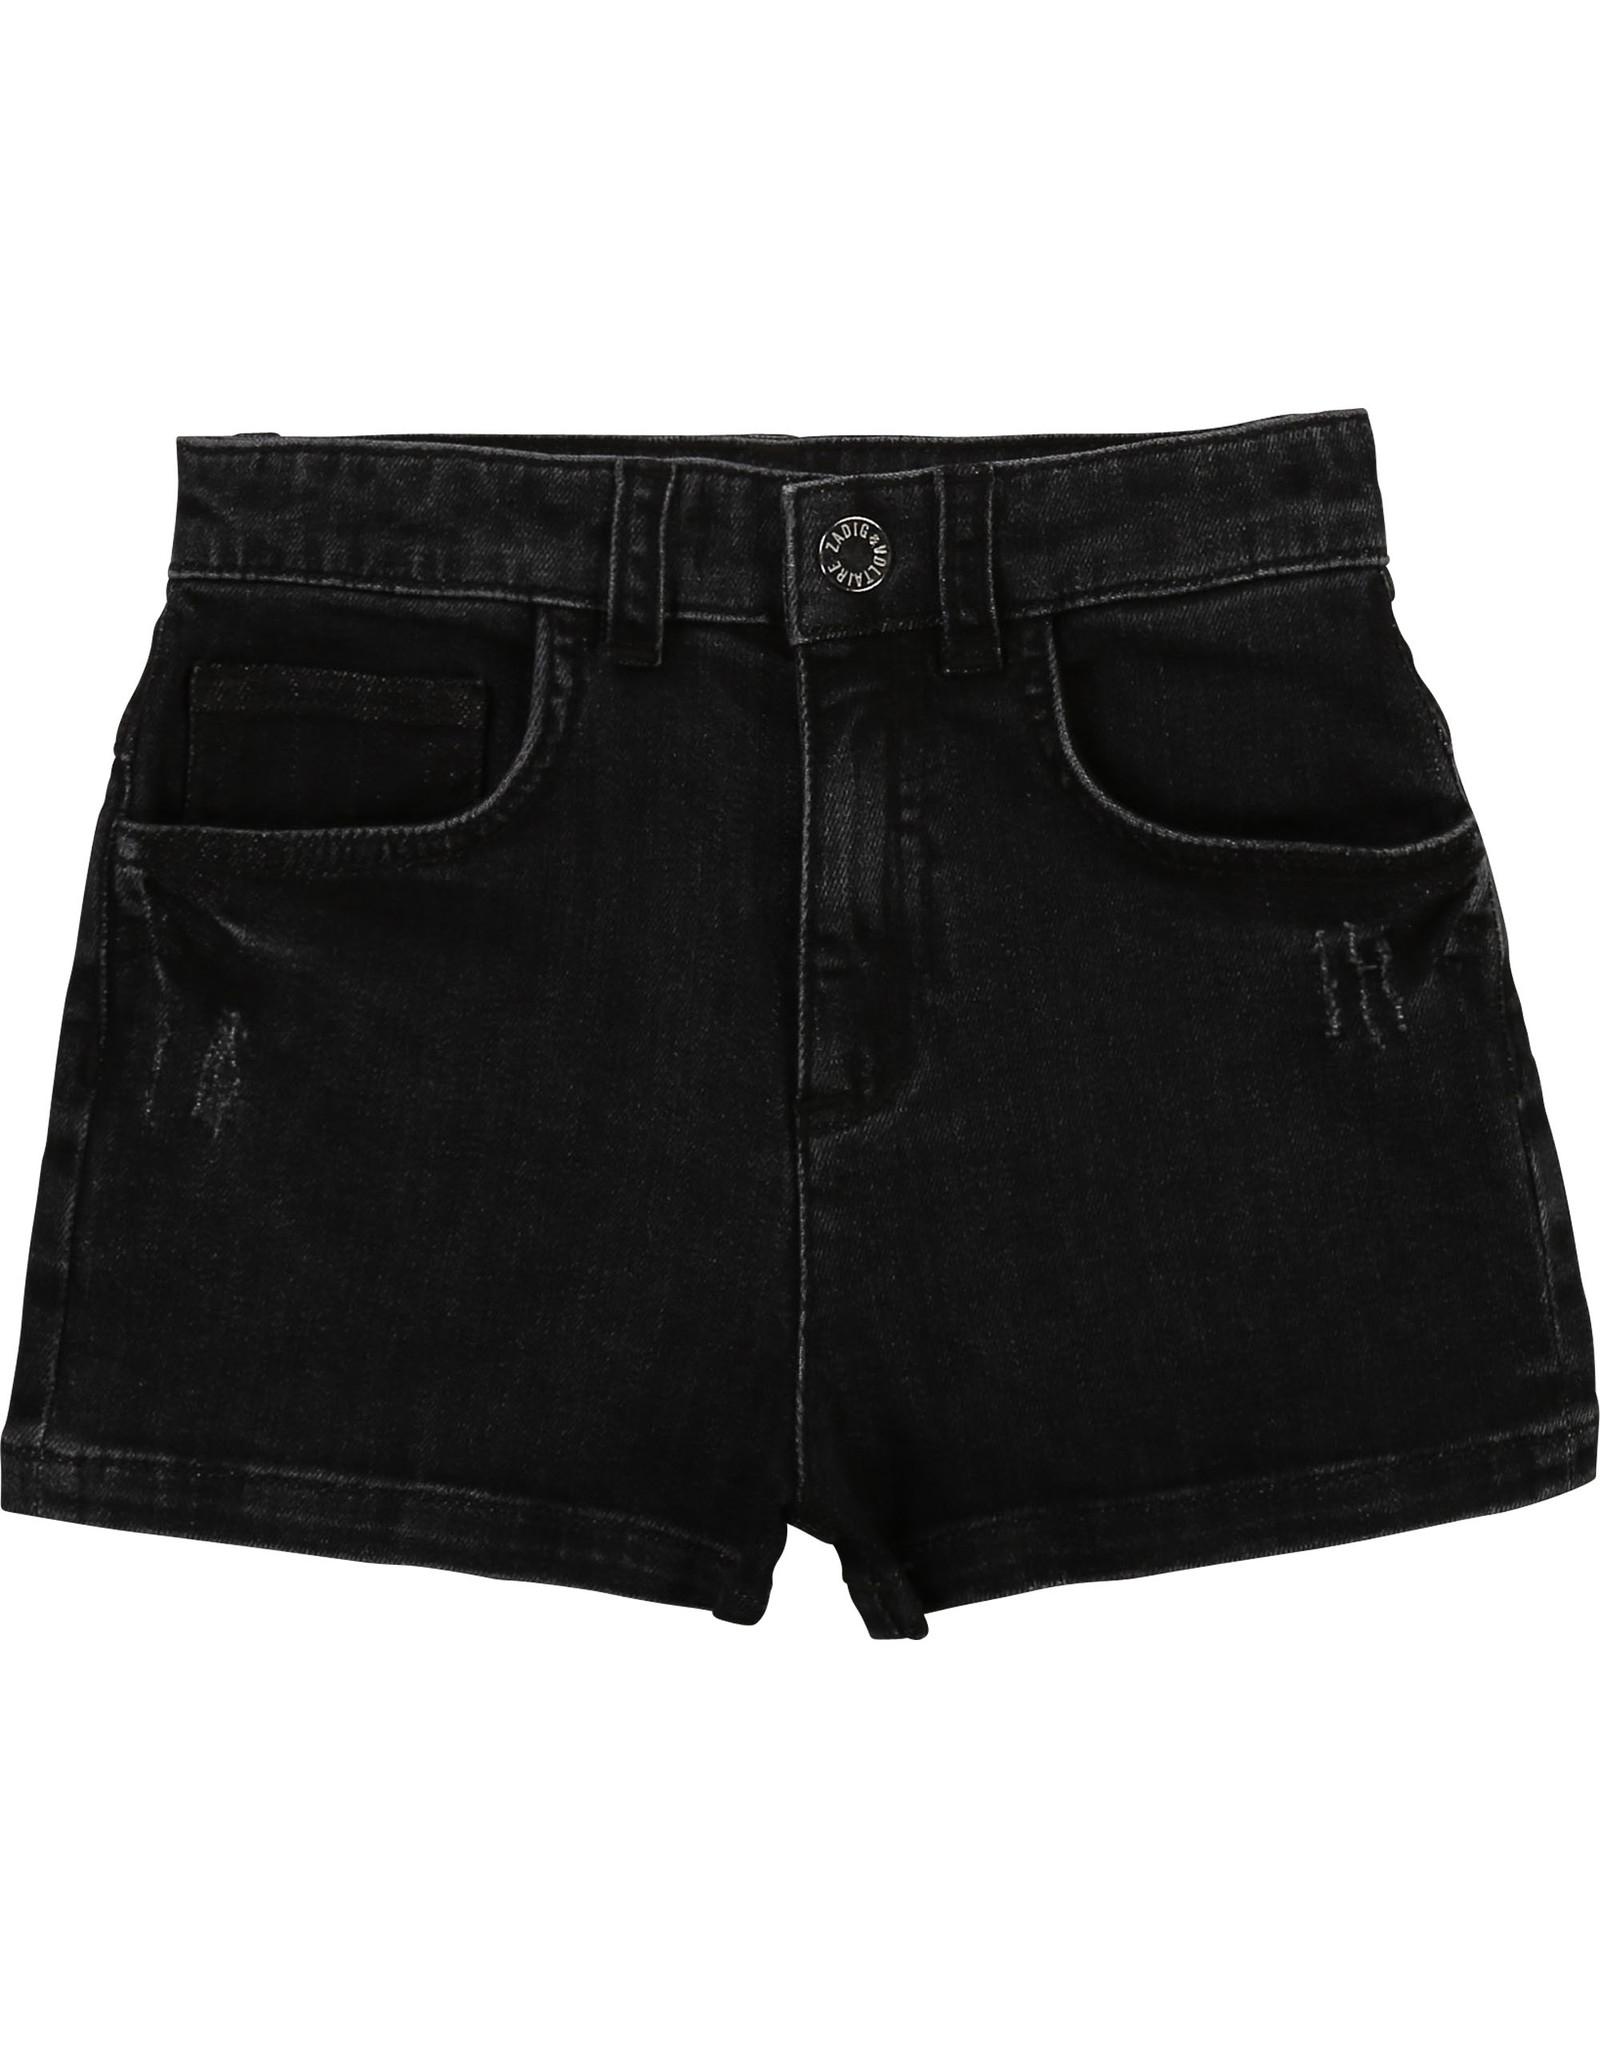 Zadig&Voltaire Z&V SS21 X14113 jeansshort